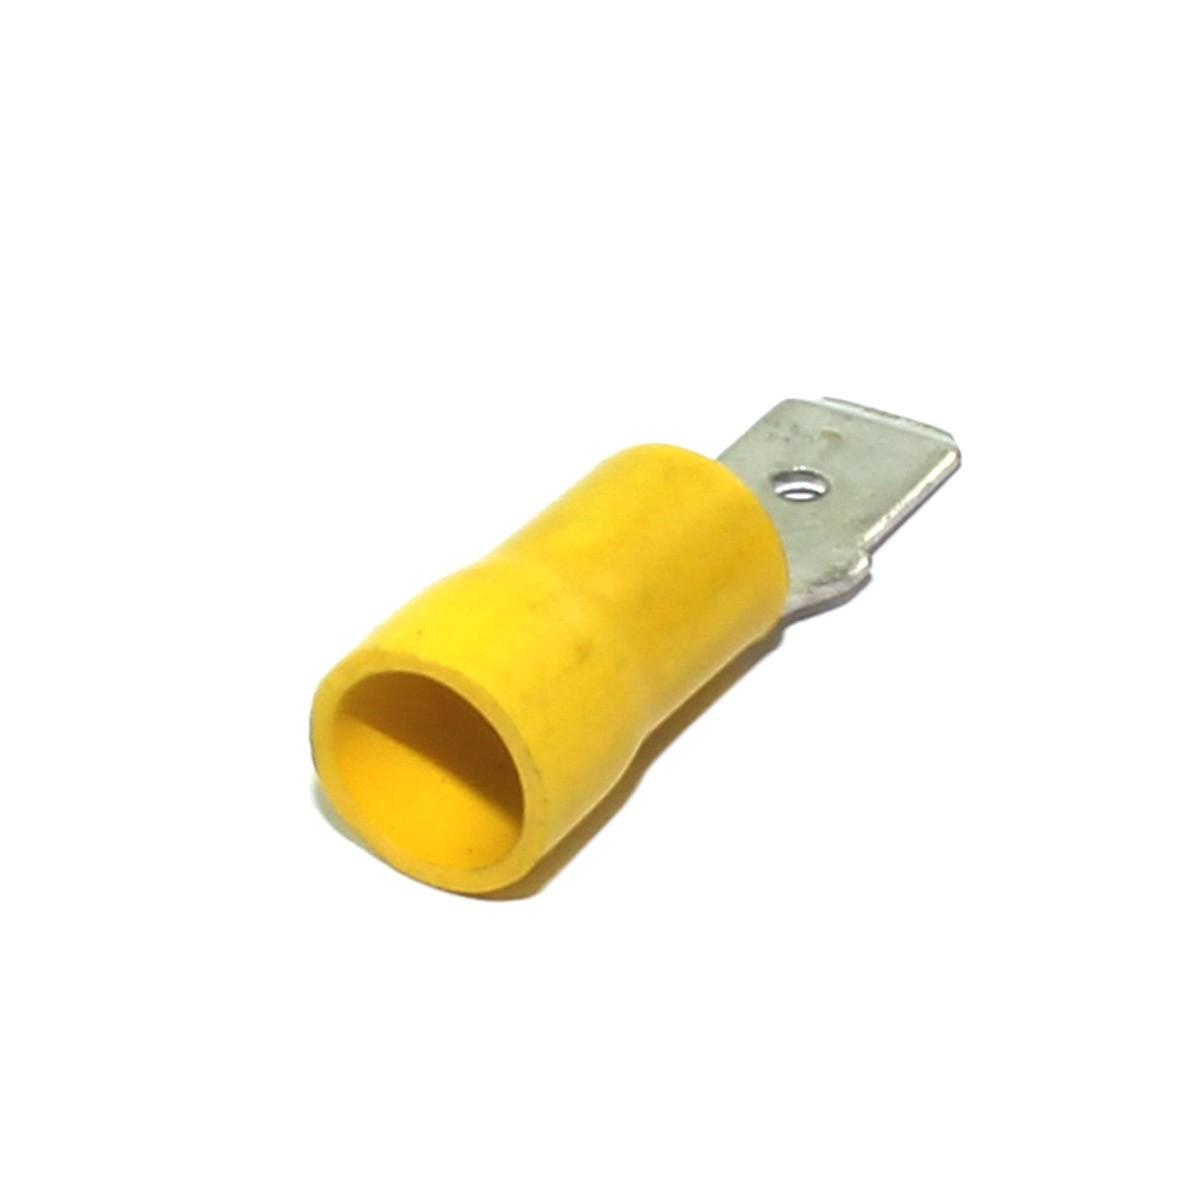 Engate Macho 270 a 660 mm Isolado - 10 Unidades - Crimper